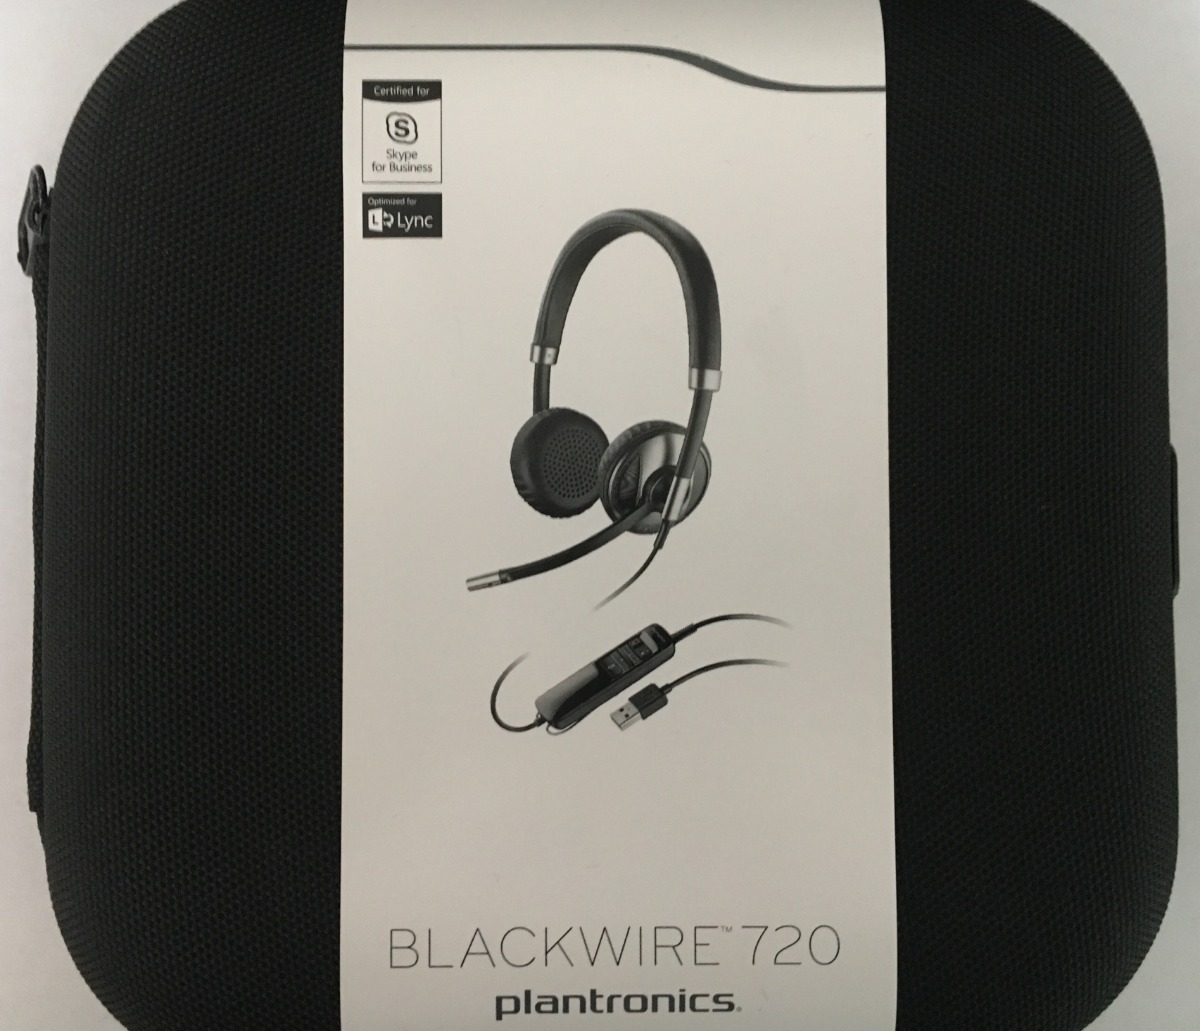 BLACKWIRE C720 WINDOWS 10 DRIVERS DOWNLOAD